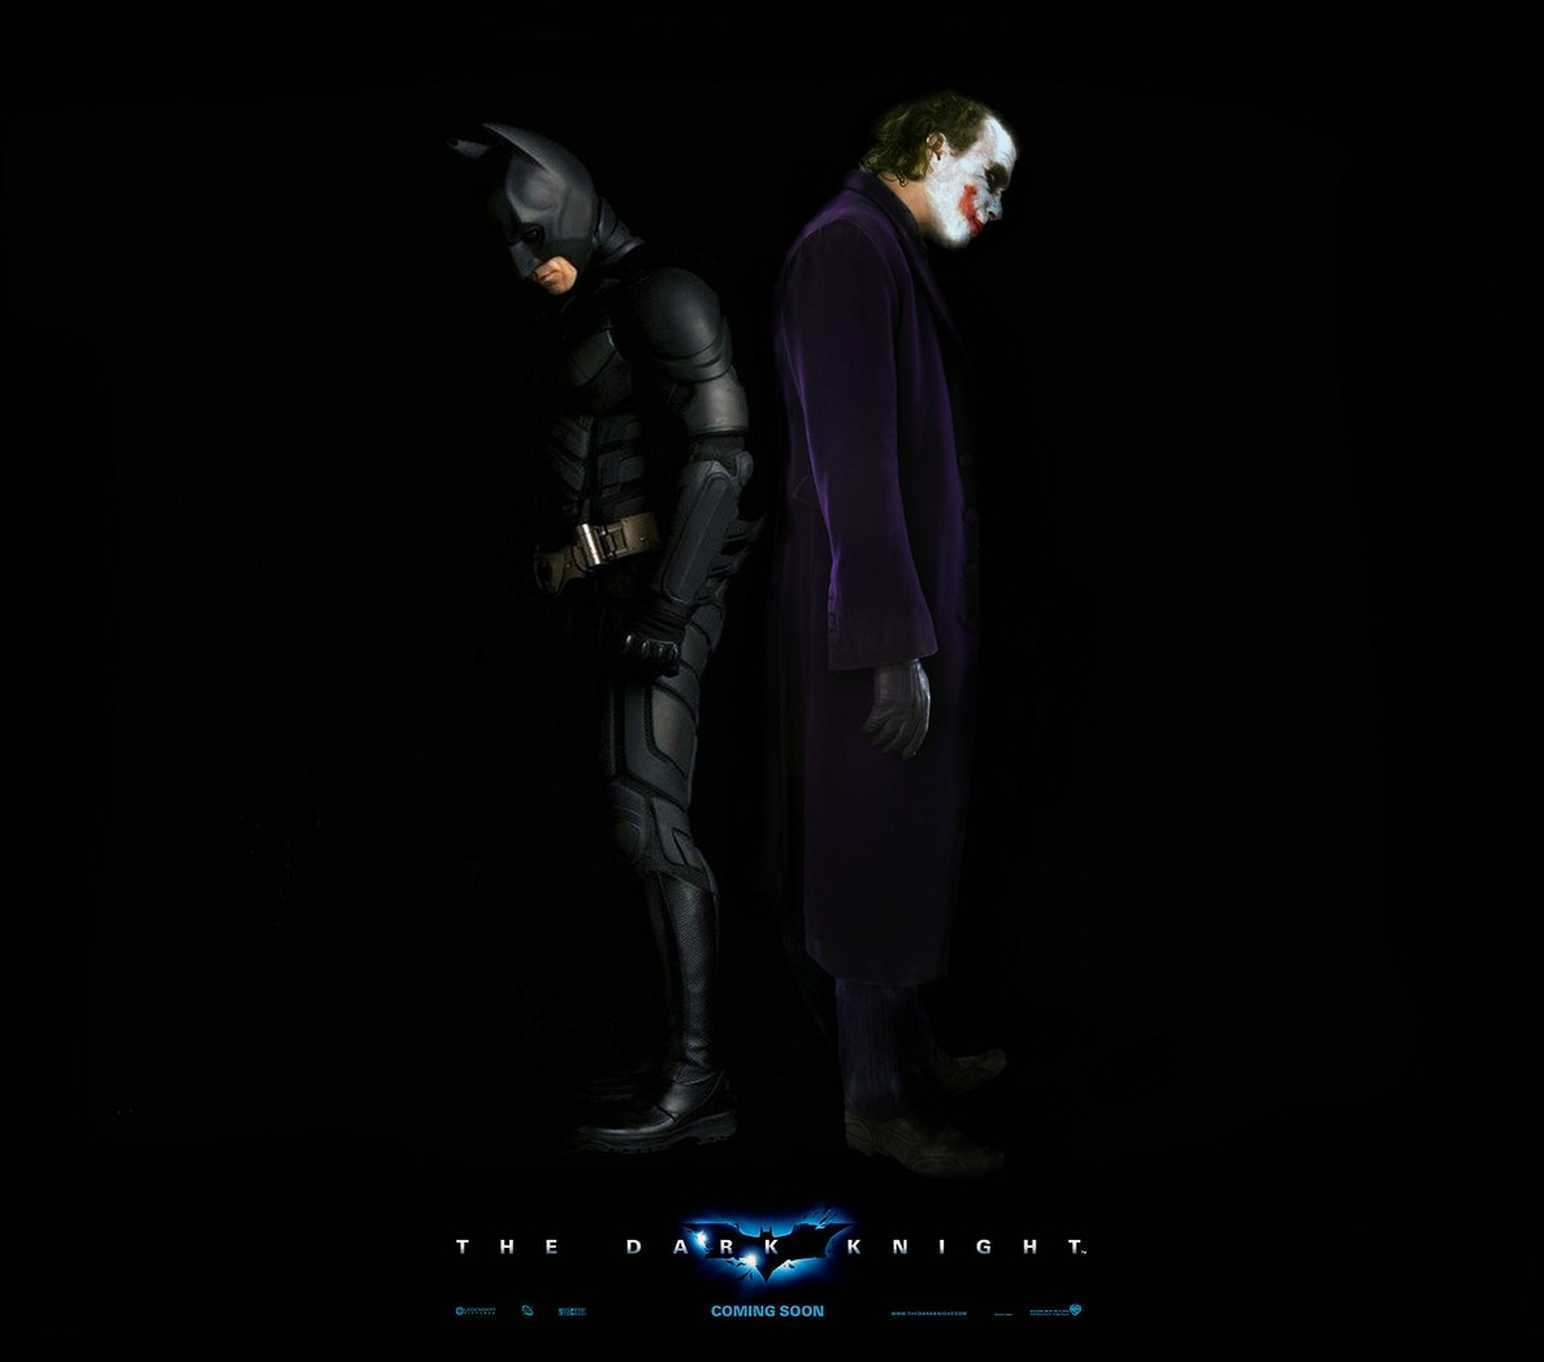 batman joker - The Dark Knight Photo (10912314) - Fanpop